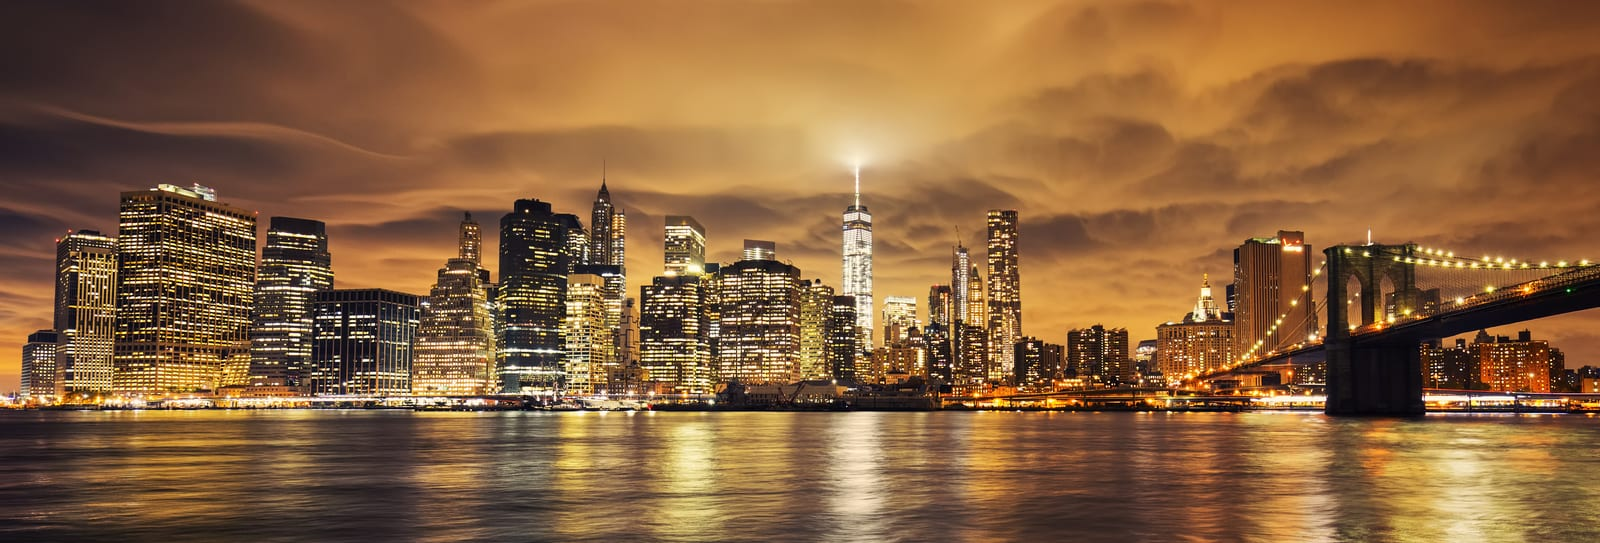 Upper Manhattan Manhattan, NY Private Investigator